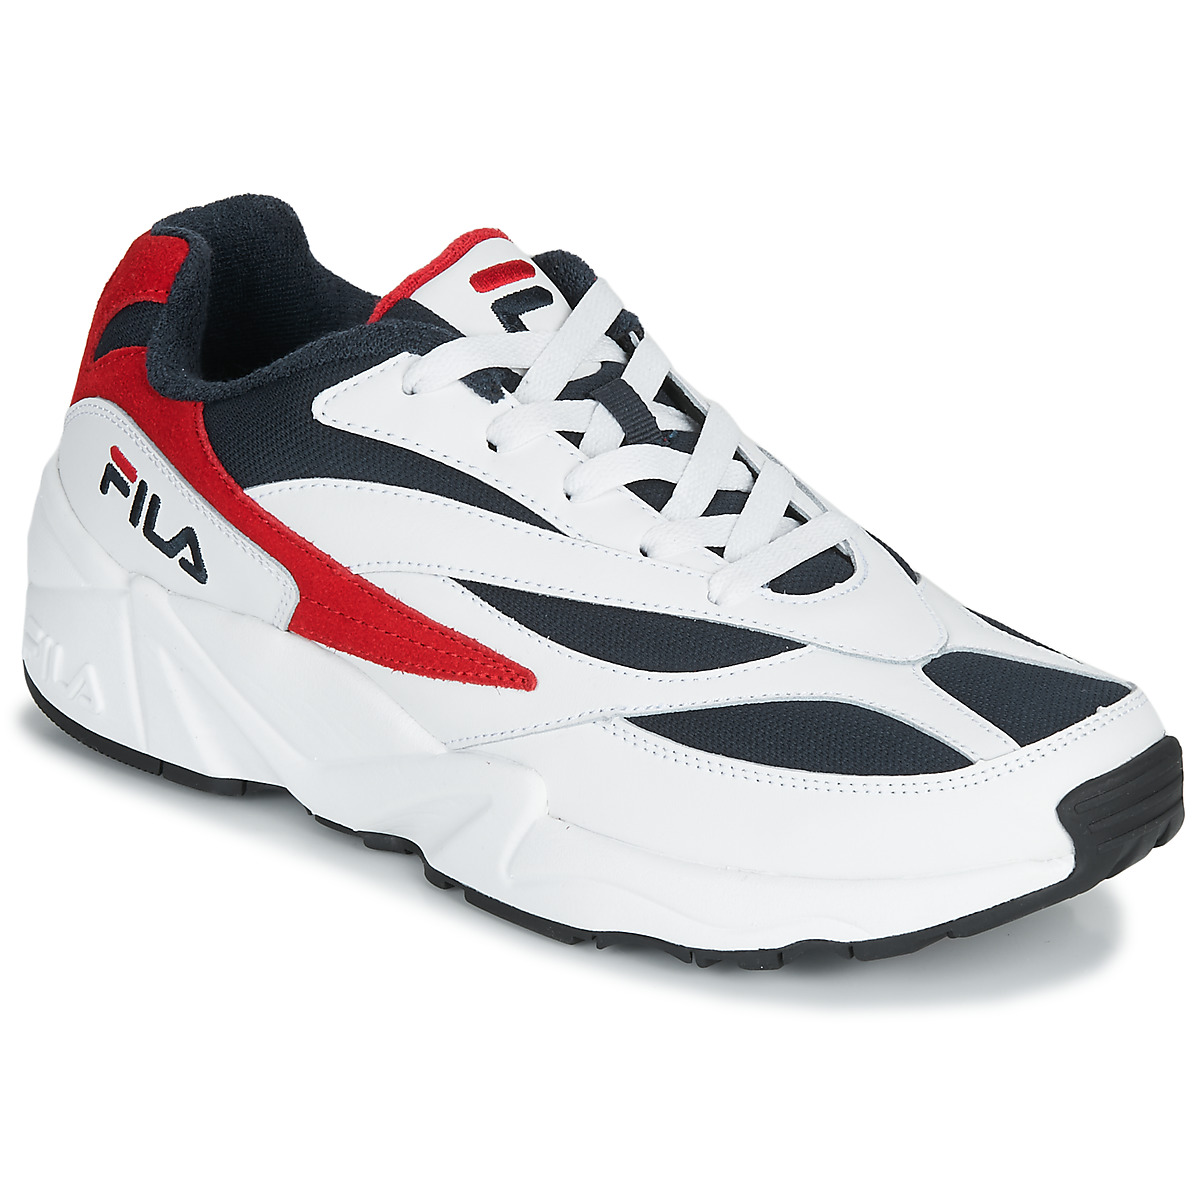 Fila V94M LOW White / Red - Fast